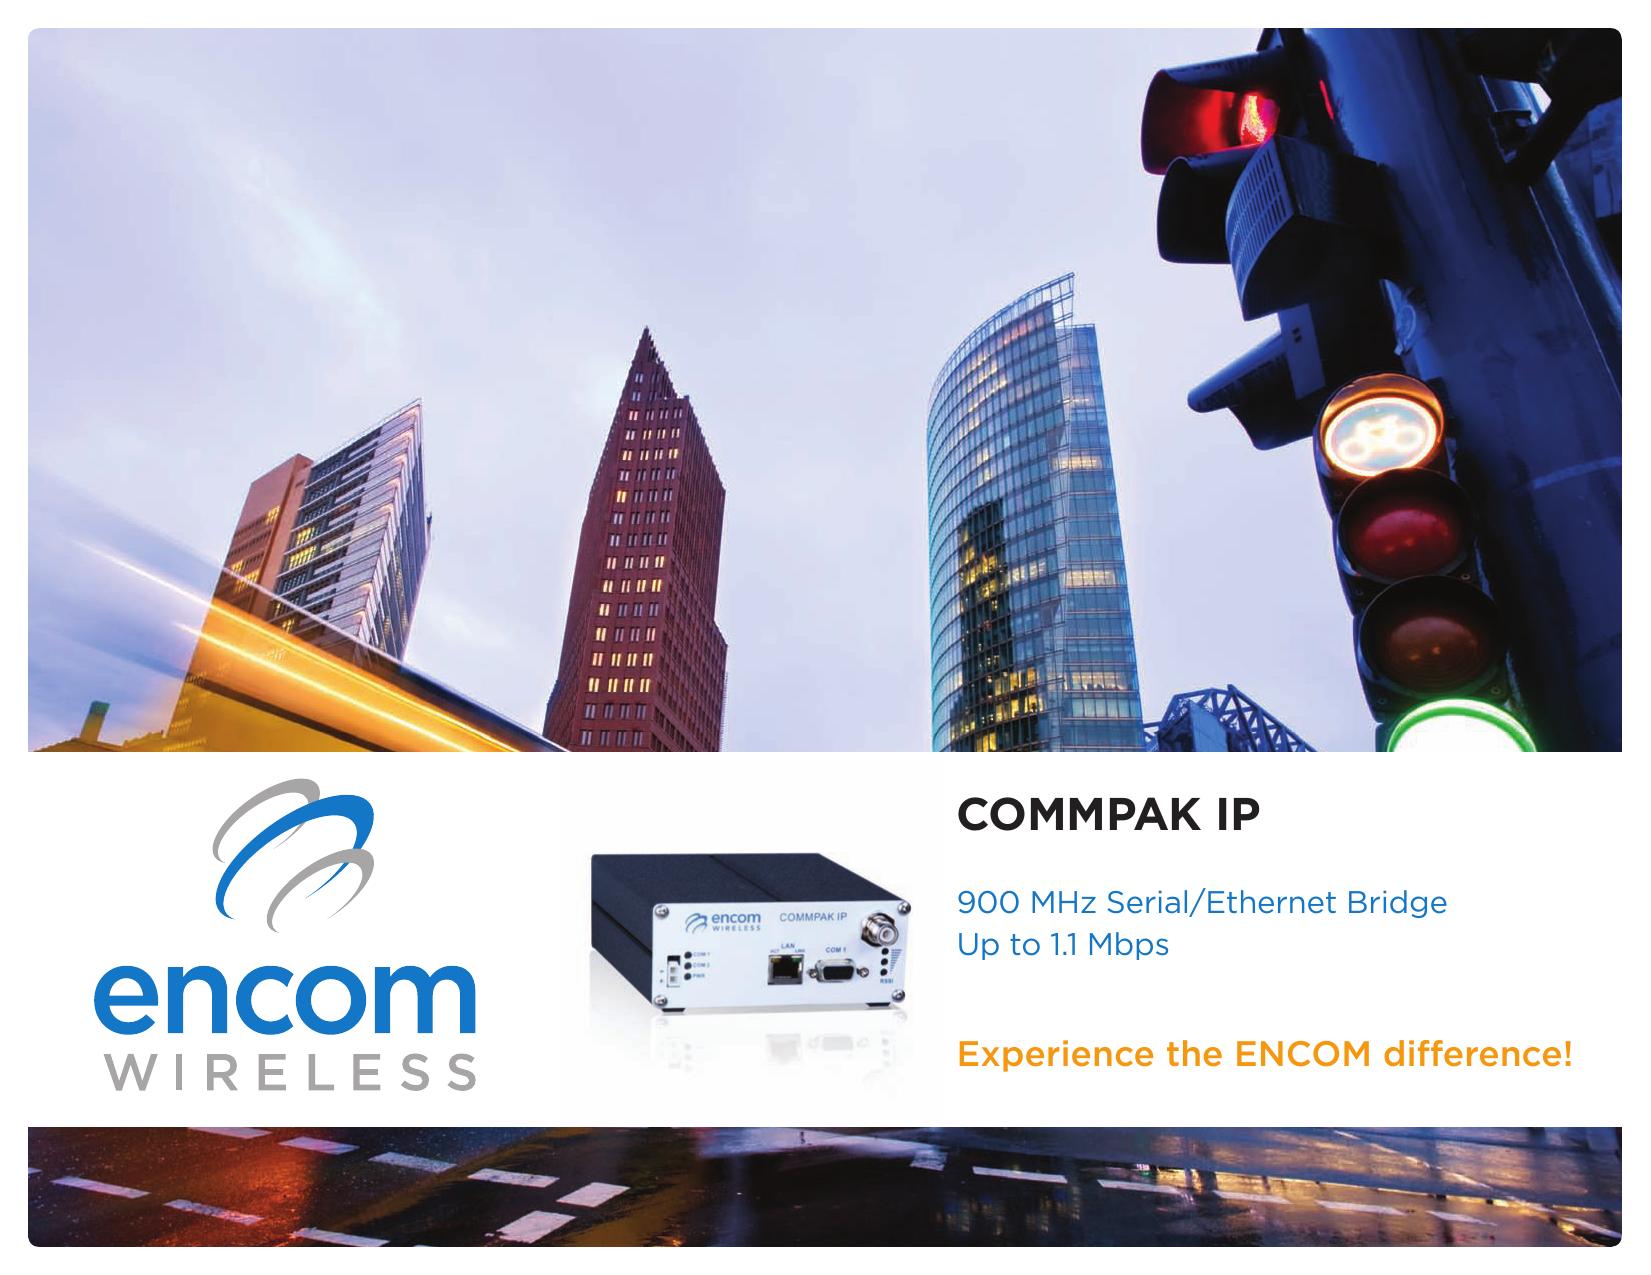 ENCOM COMMPAK IP 900MHz Serial Ethernet Bridge